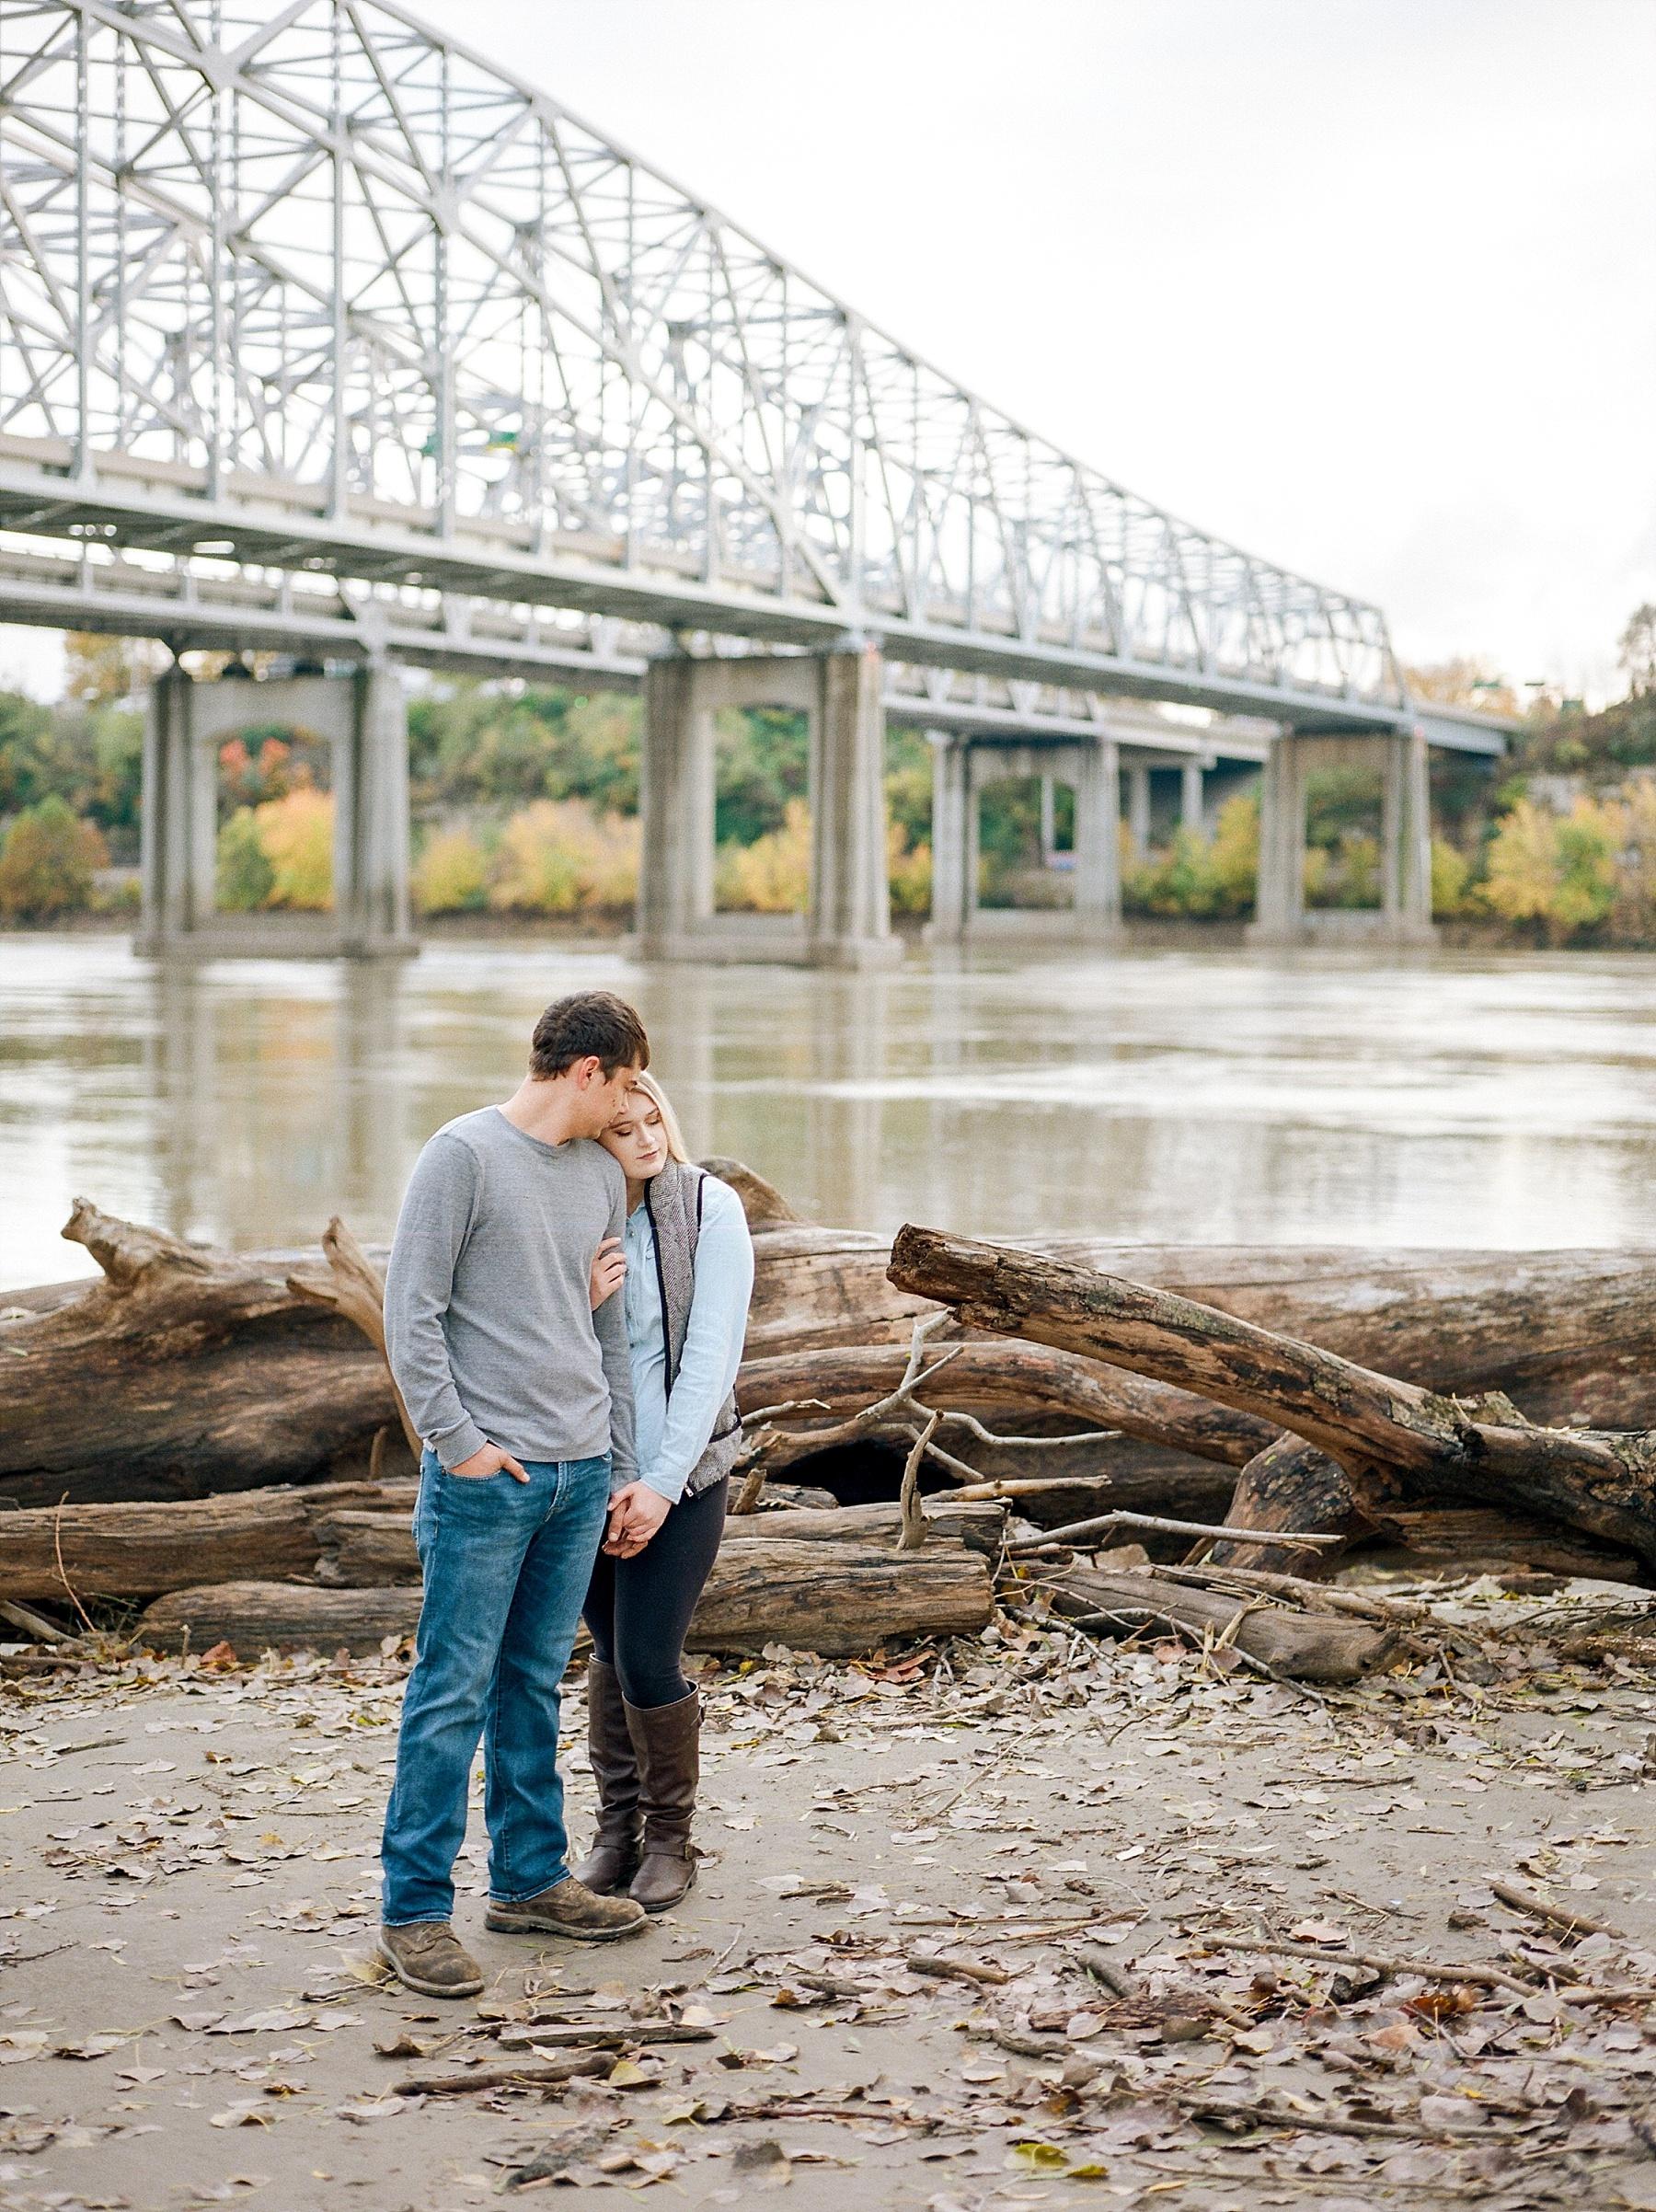 Fall Couples Session on Shore of Missouri River by Kelsi Kliethermes Photography Kansas City Missouri Wedding Photographer_0009.jpg